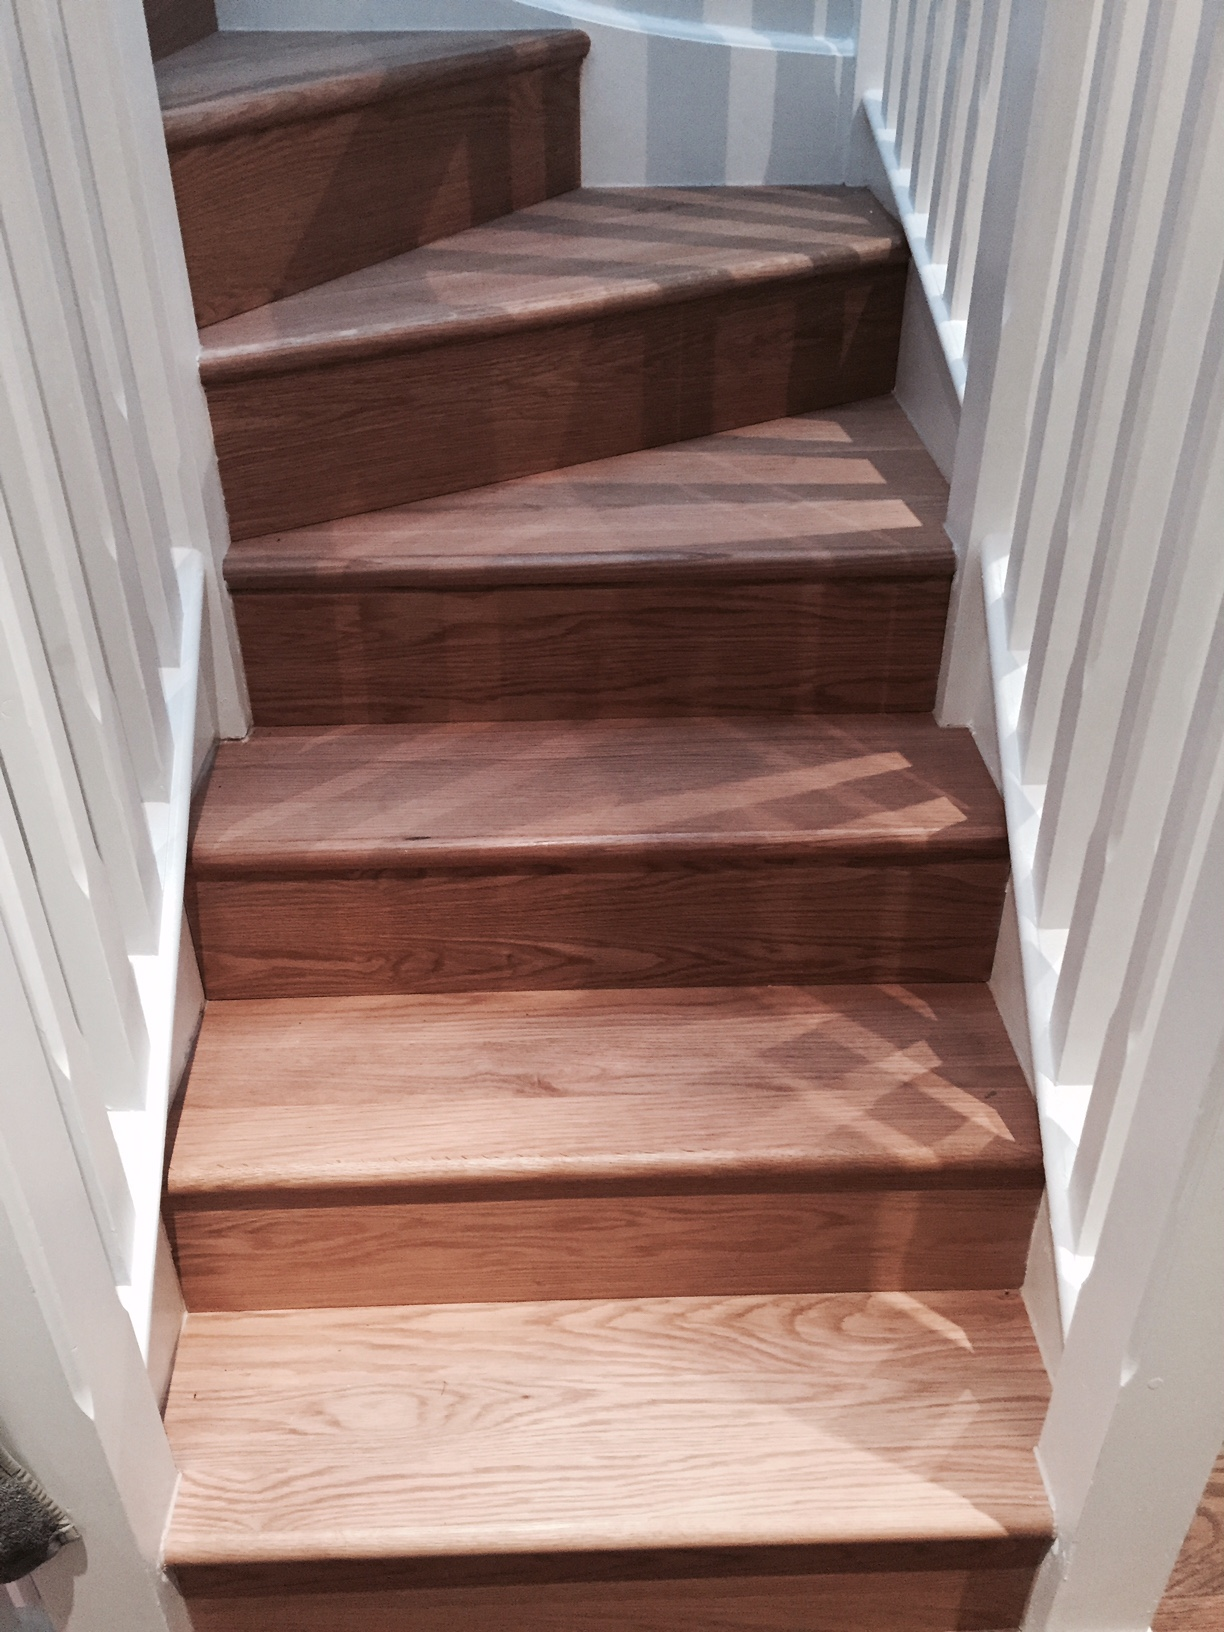 Oak basics stair cladding stair cladding tread riser basics oak stair cladding winder sets image malvernweather Gallery